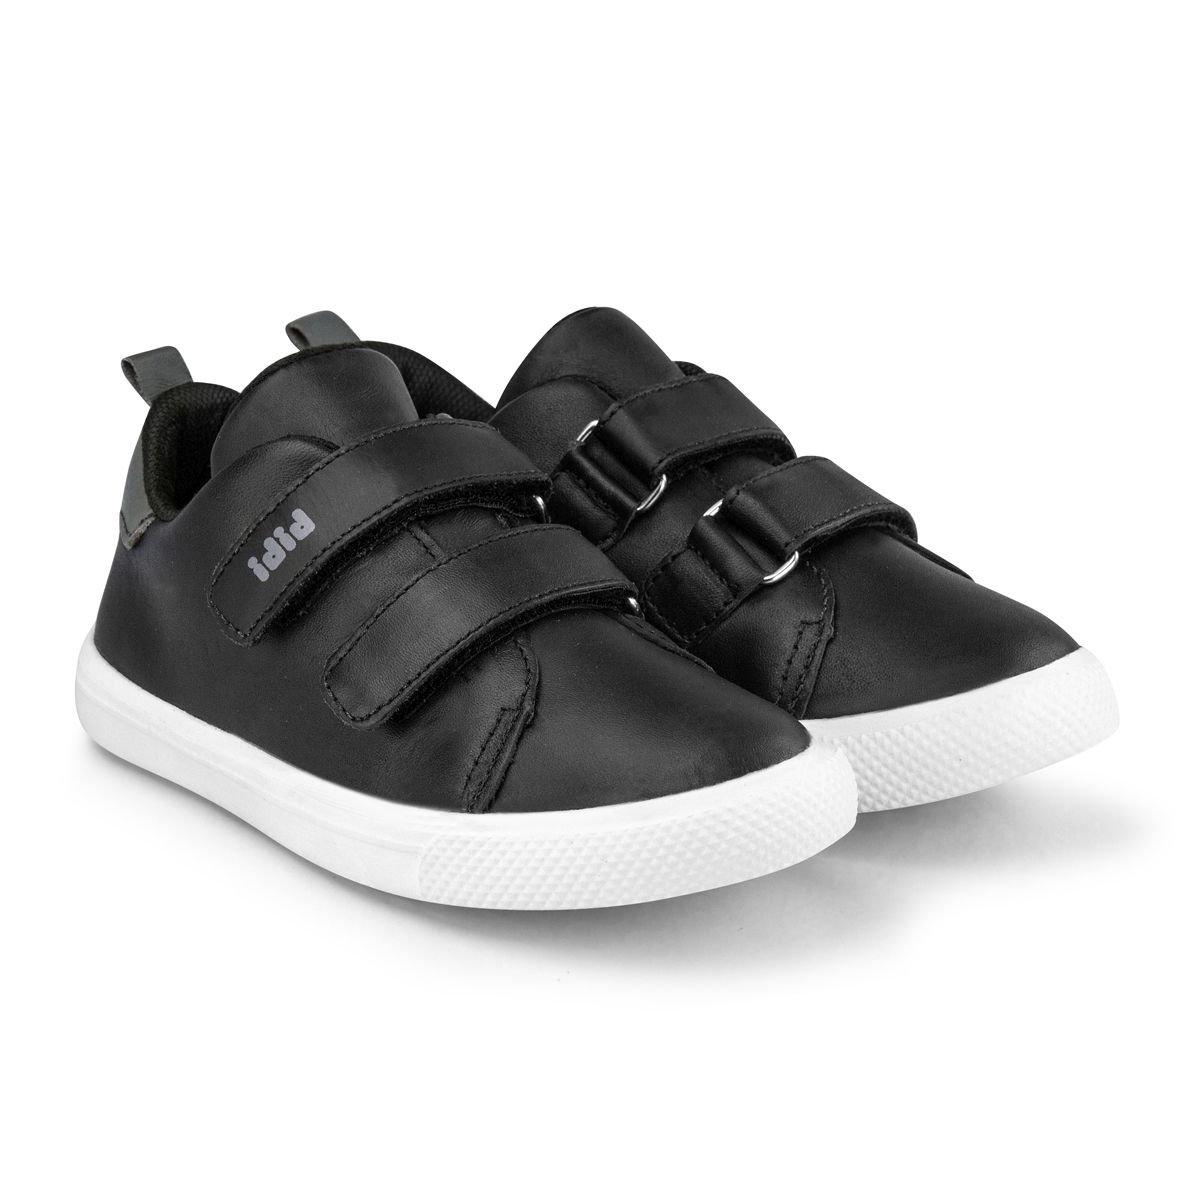 Pantofi sport Bibi Shoes Agility Mini, Negru